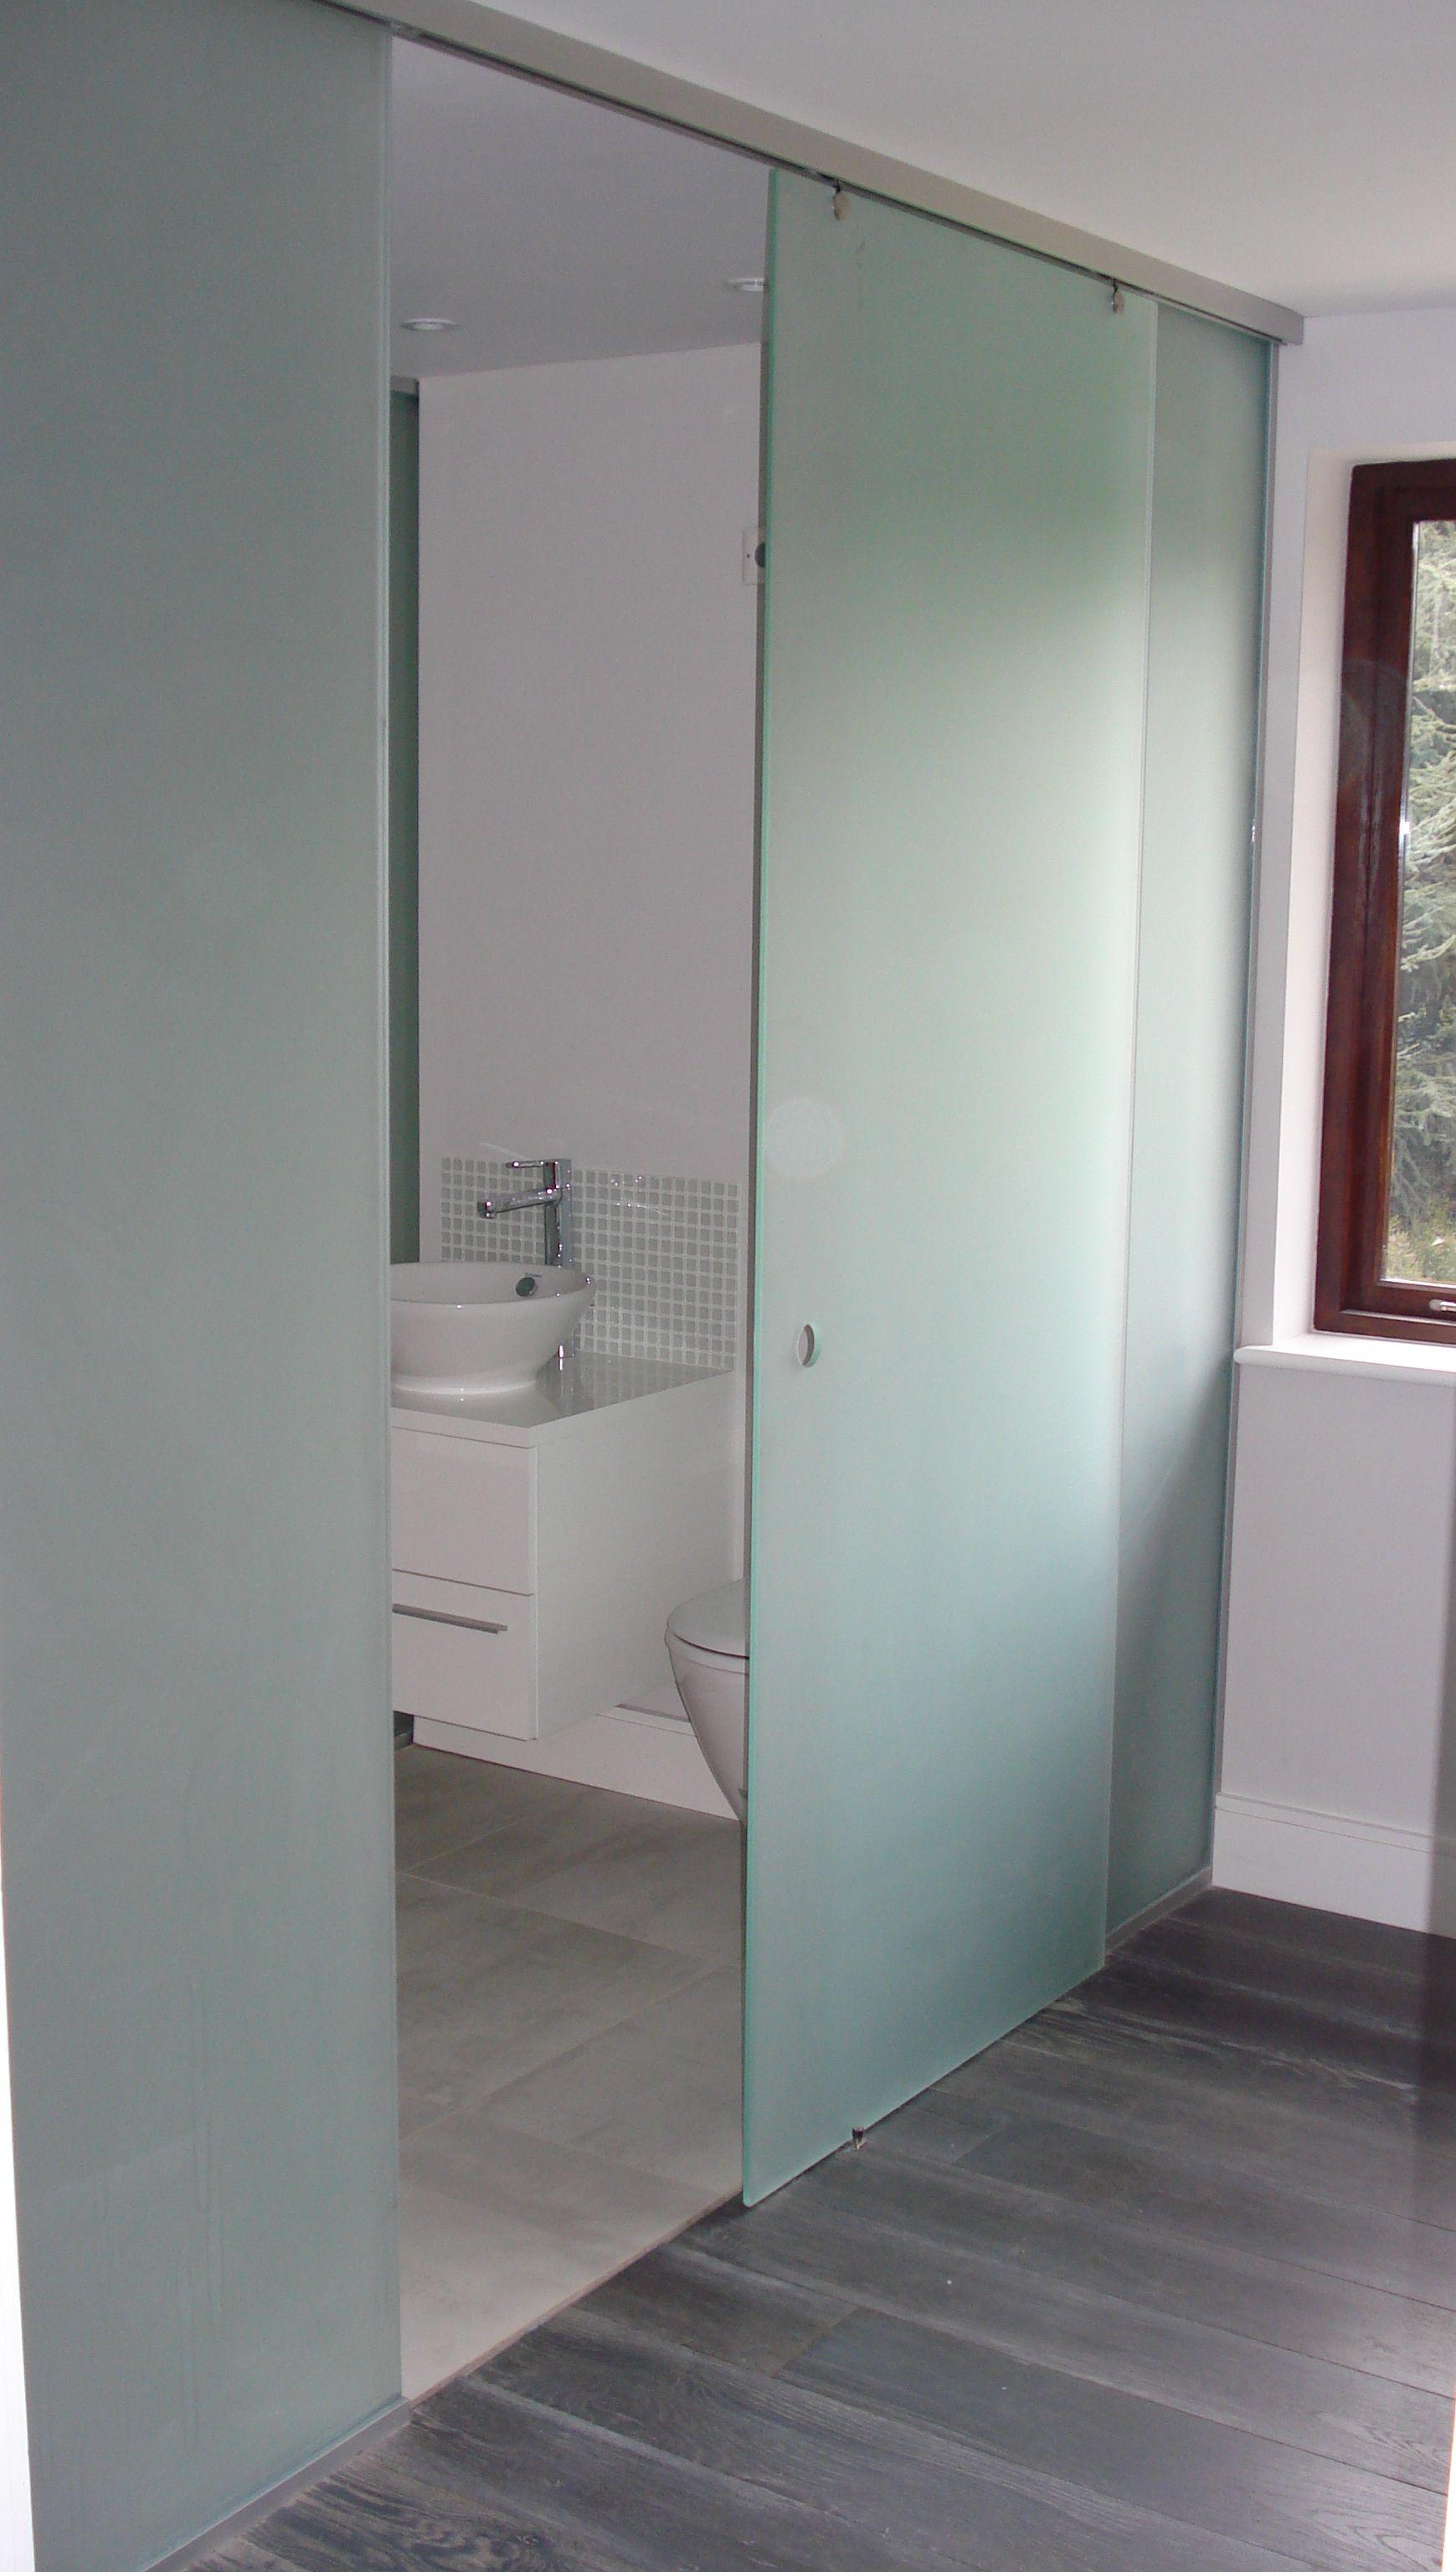 Sliding glass doors bathroom - This Sliding Glass Door Idea Would Be Excellent For The En Suite Toilet Let S